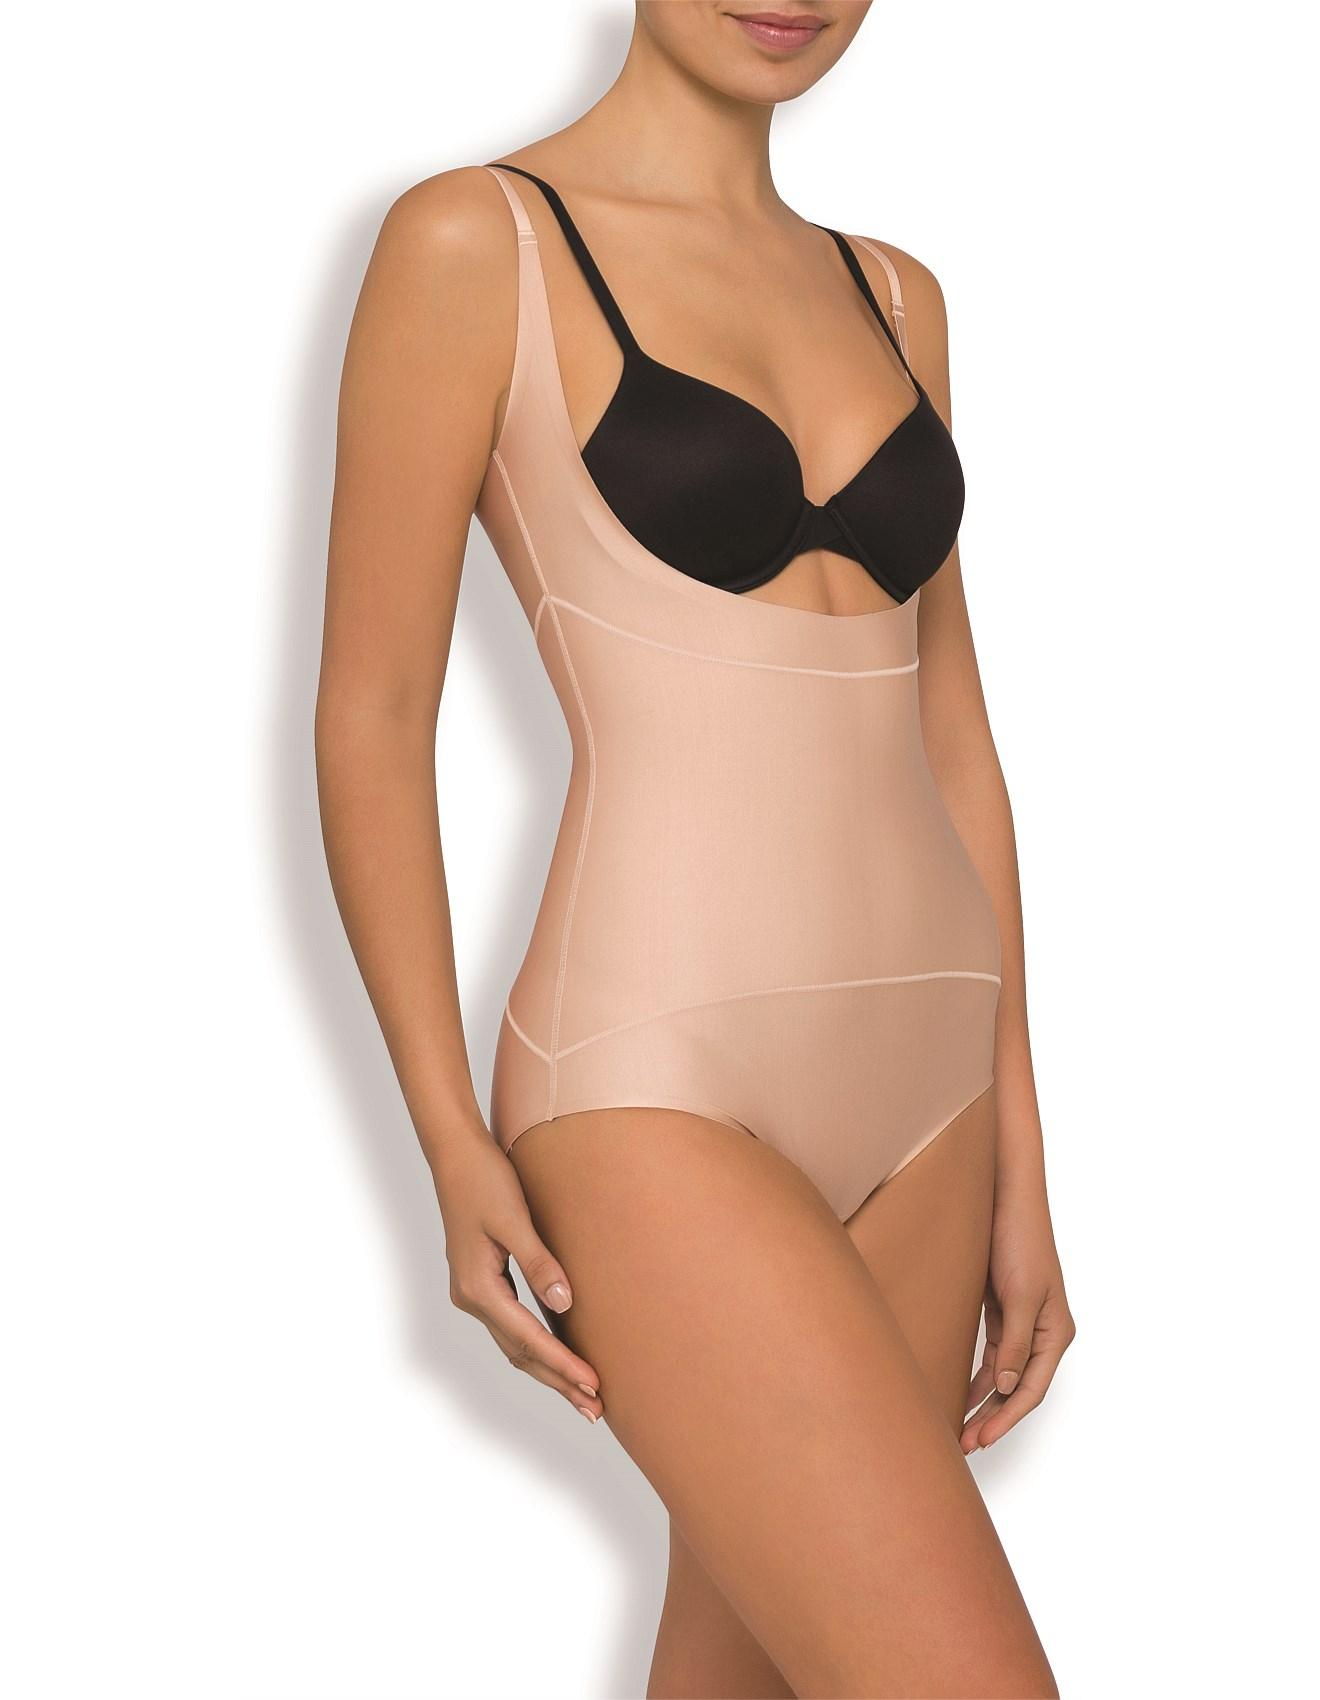 d7b210277b85b Body Architect Underbust Bodysuit. 1  2  3. Zoom. Nancy Ganz